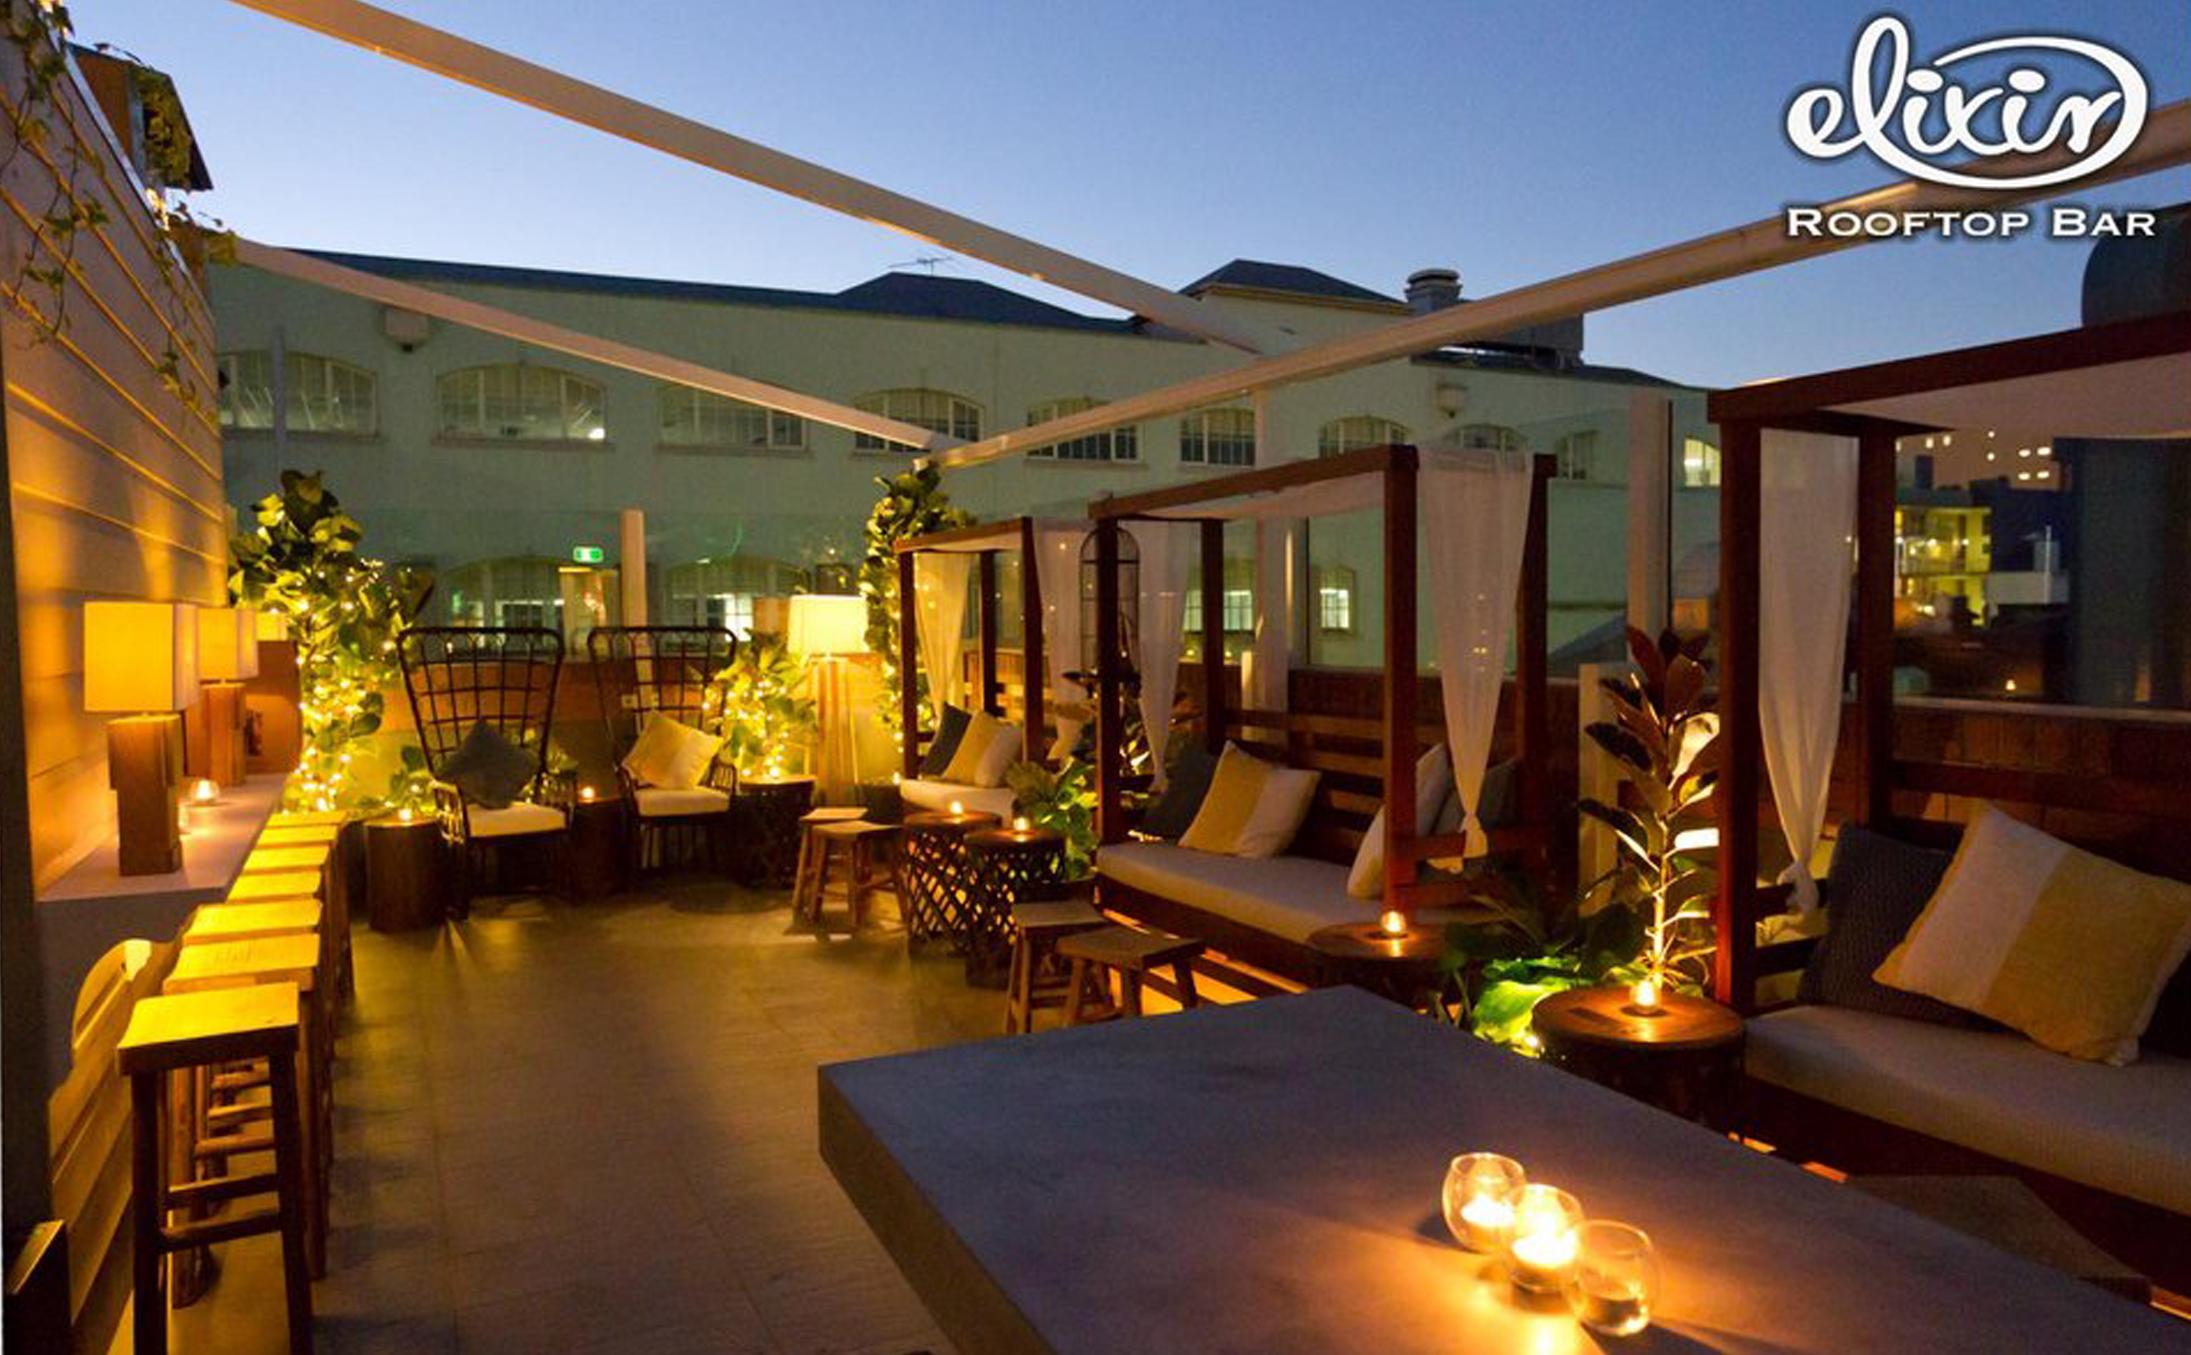 Elixir Rooftop Bar The Good Guide